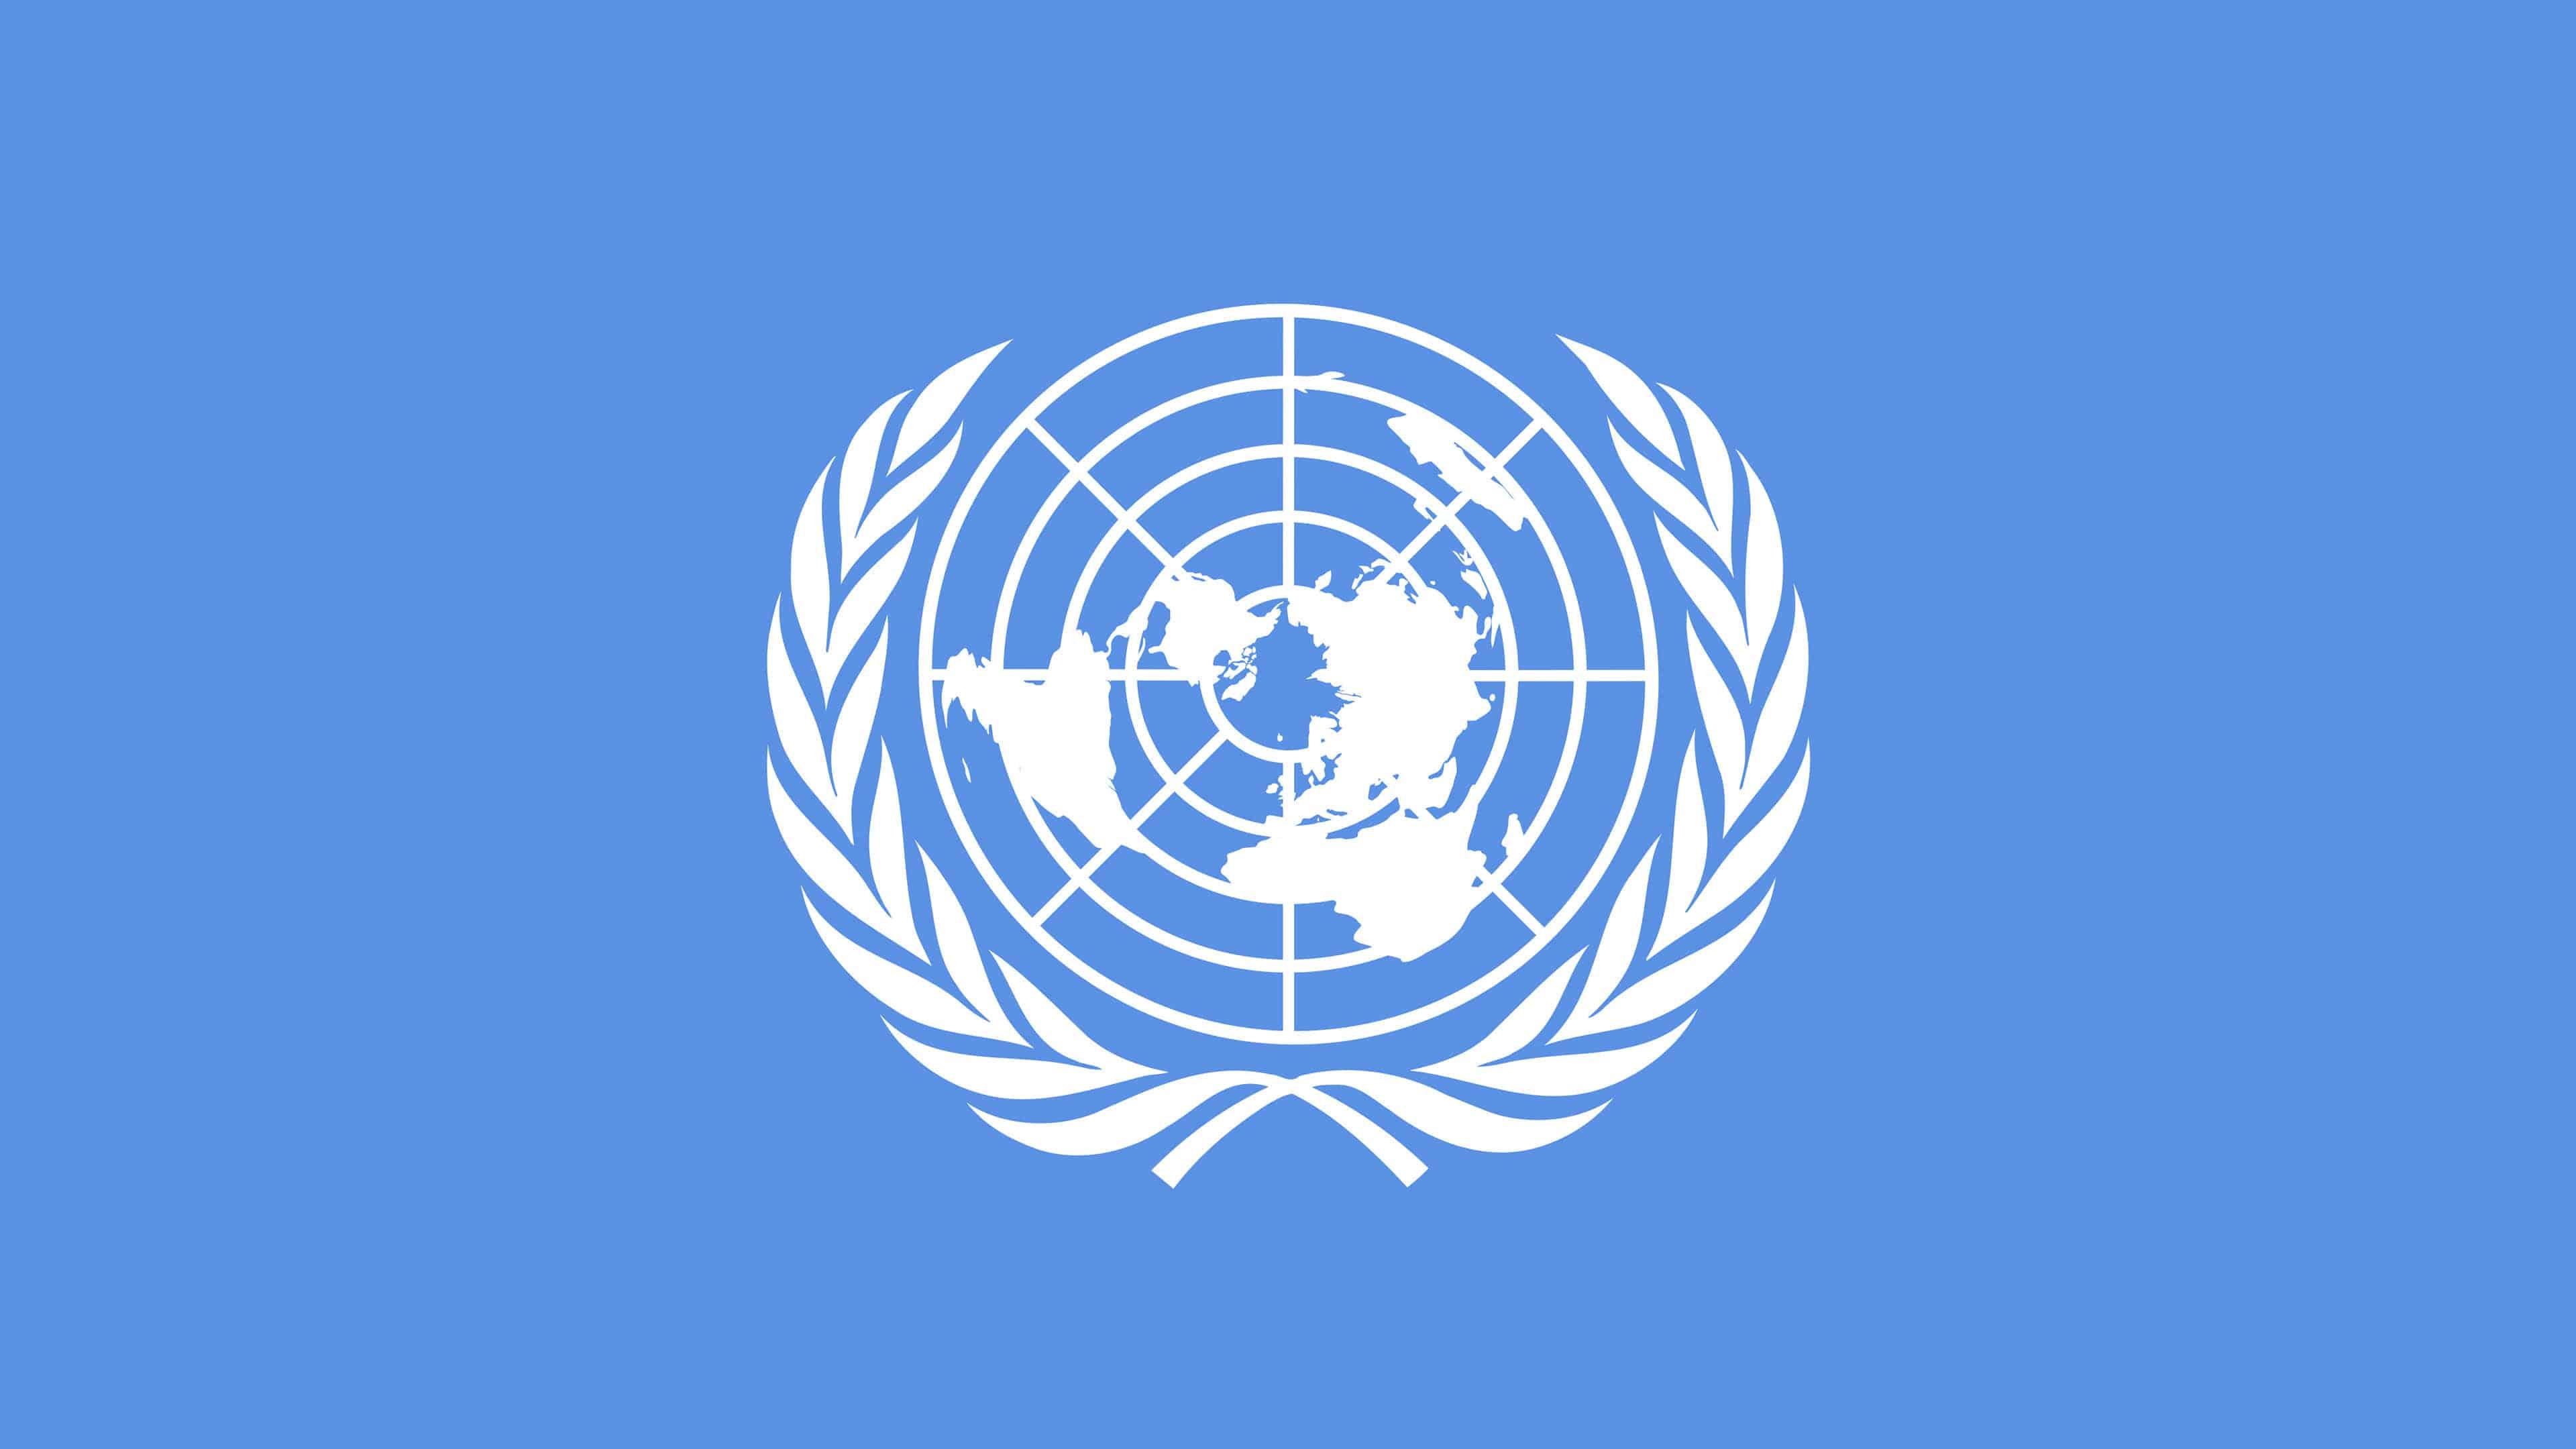 united nations logo uhd 4k wallpaper